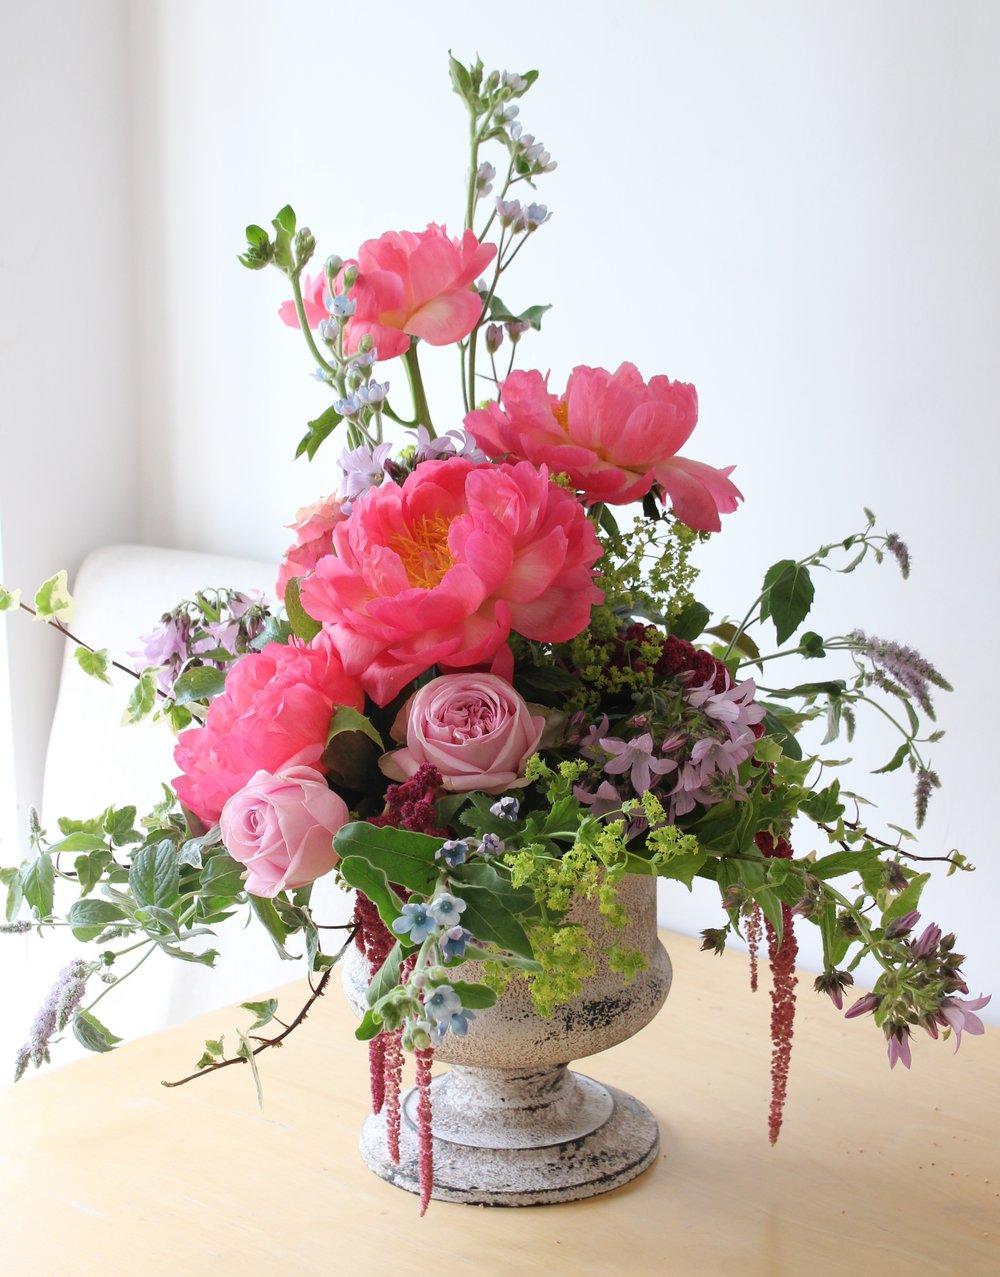 Paeonia 'Flame', Amaranthus, Oxypetalum coeruleum, Campanula glomerata, Mentha 'Tigra' an Rosa 'Aqua'